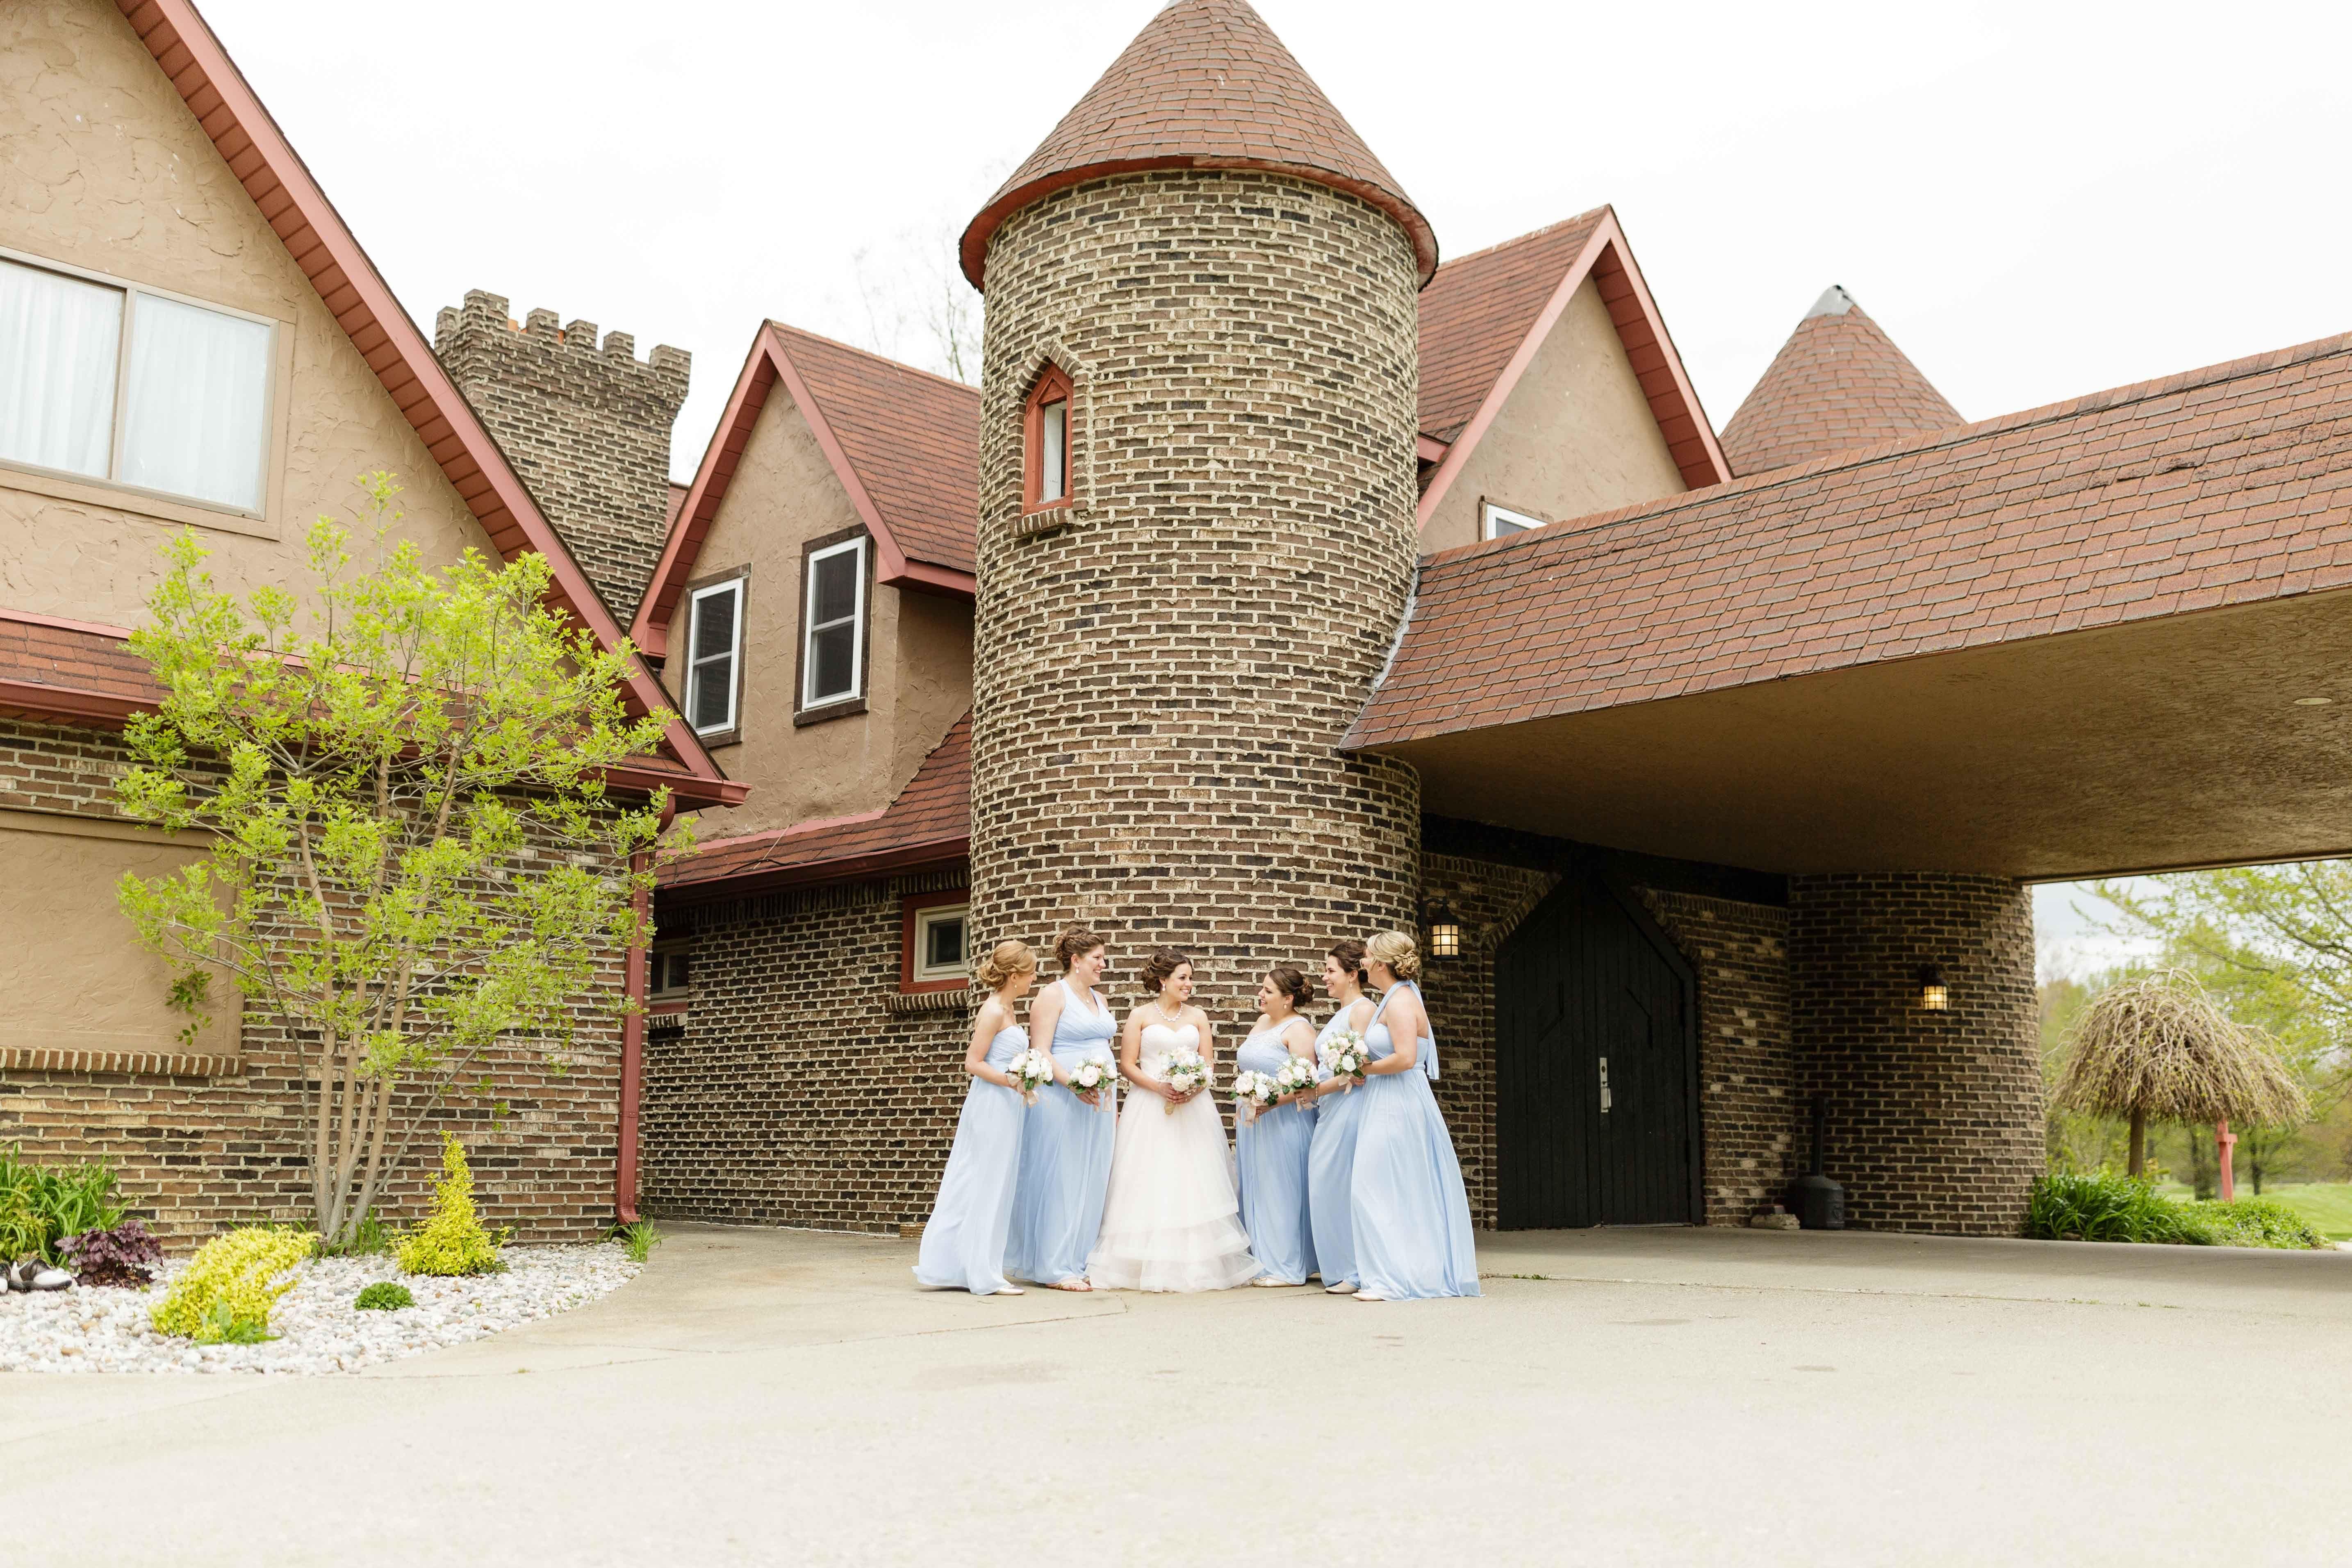 Castle Wedding Castle Creek Golf Course Unique Posing Ideas Bridesmaids Pictures Michiga Michigan Wedding Bridesmaid Pictures Michigan Wedding Photographer